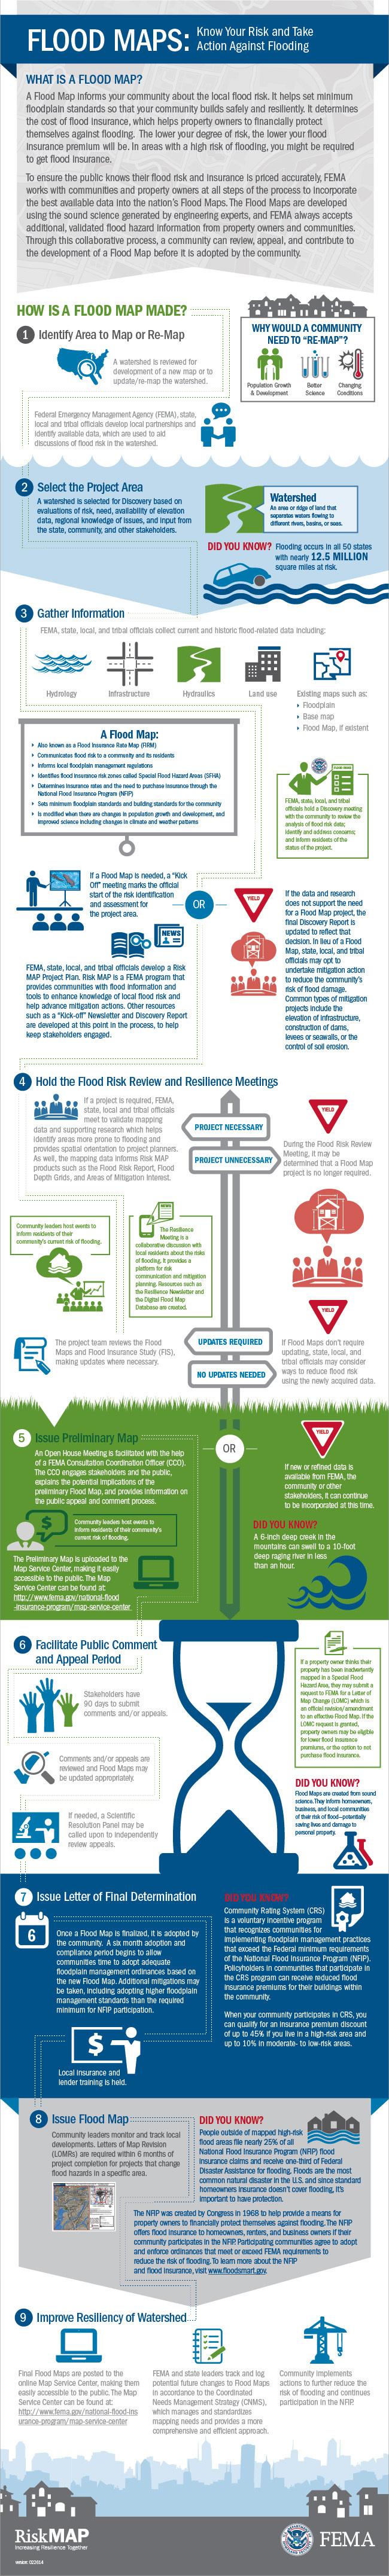 FEMA Infographic 022614-01